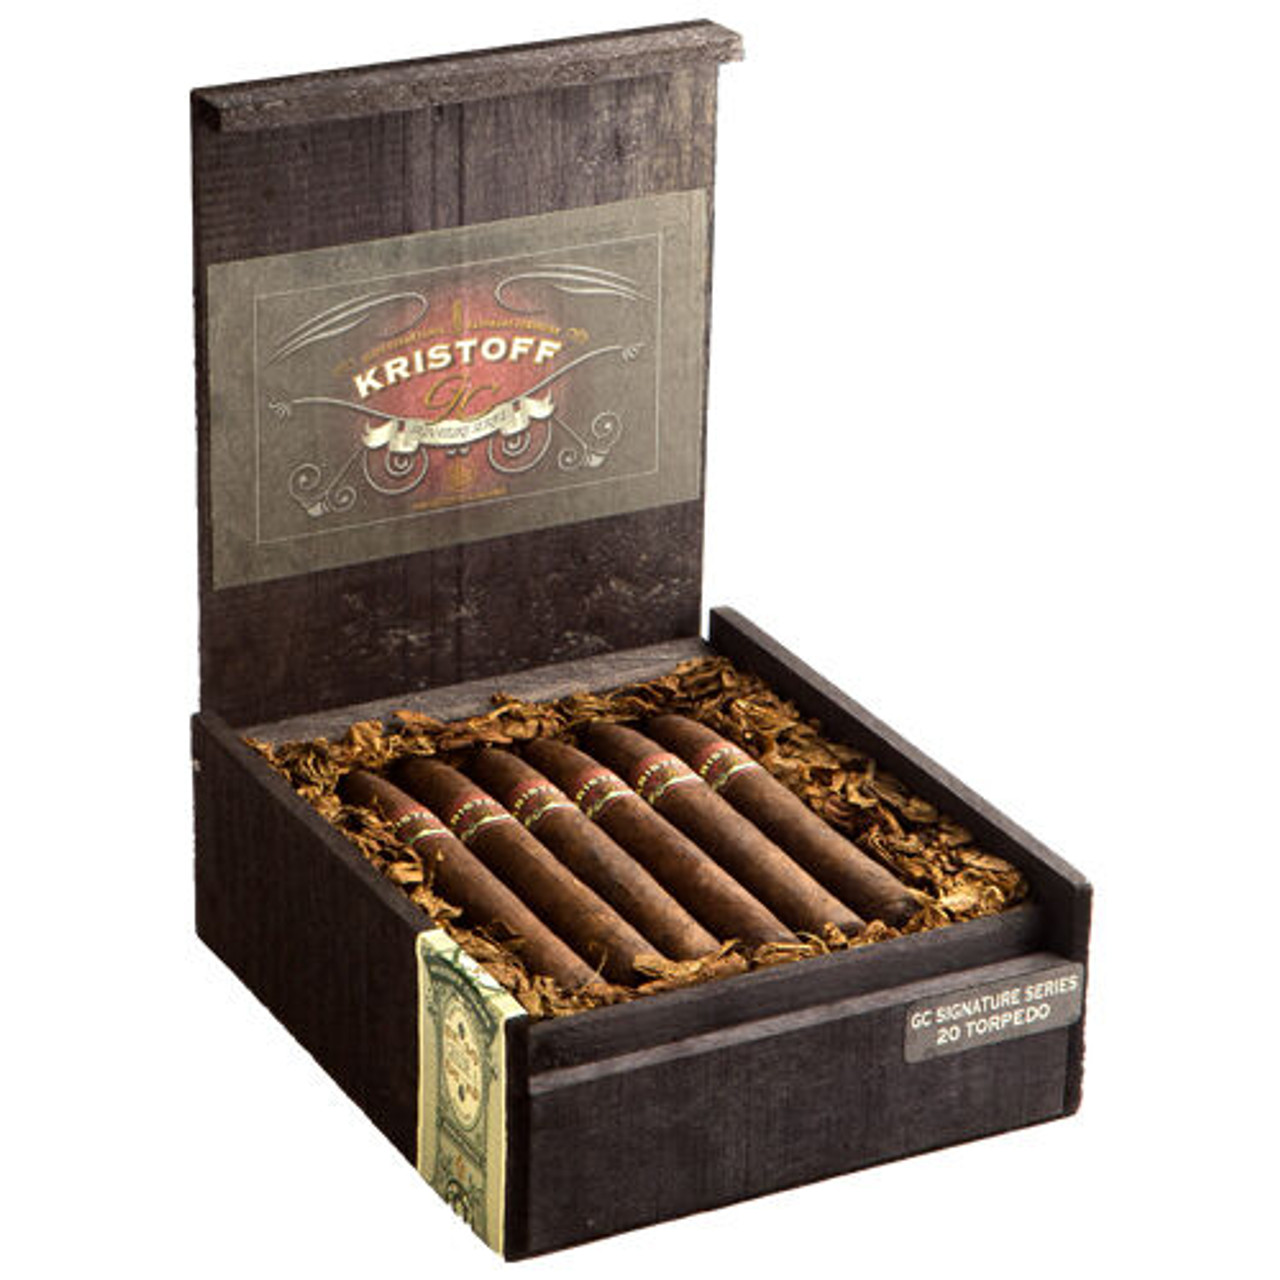 Kristoff GC Signature Series Churchill Cigars - 7.0 x 50 (Box of 20)